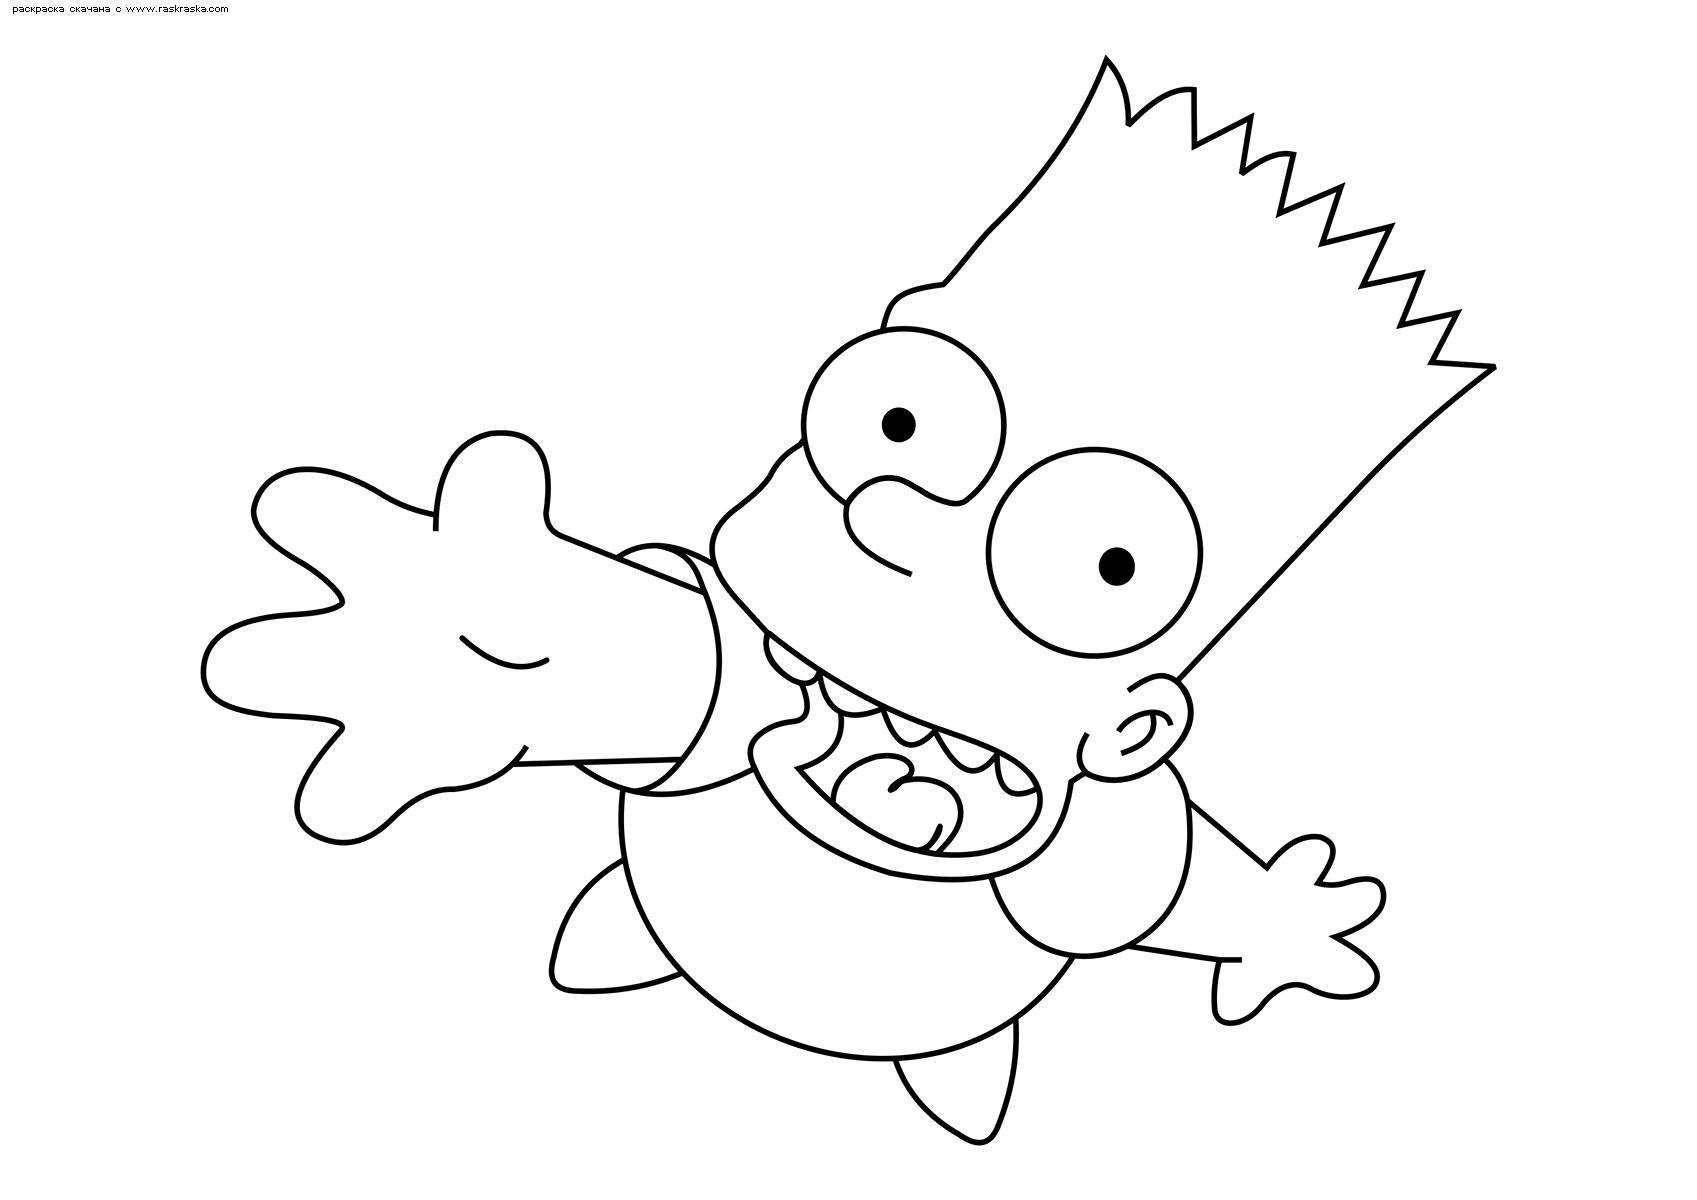 Раскраска Барт. Раскраска Симпсоны